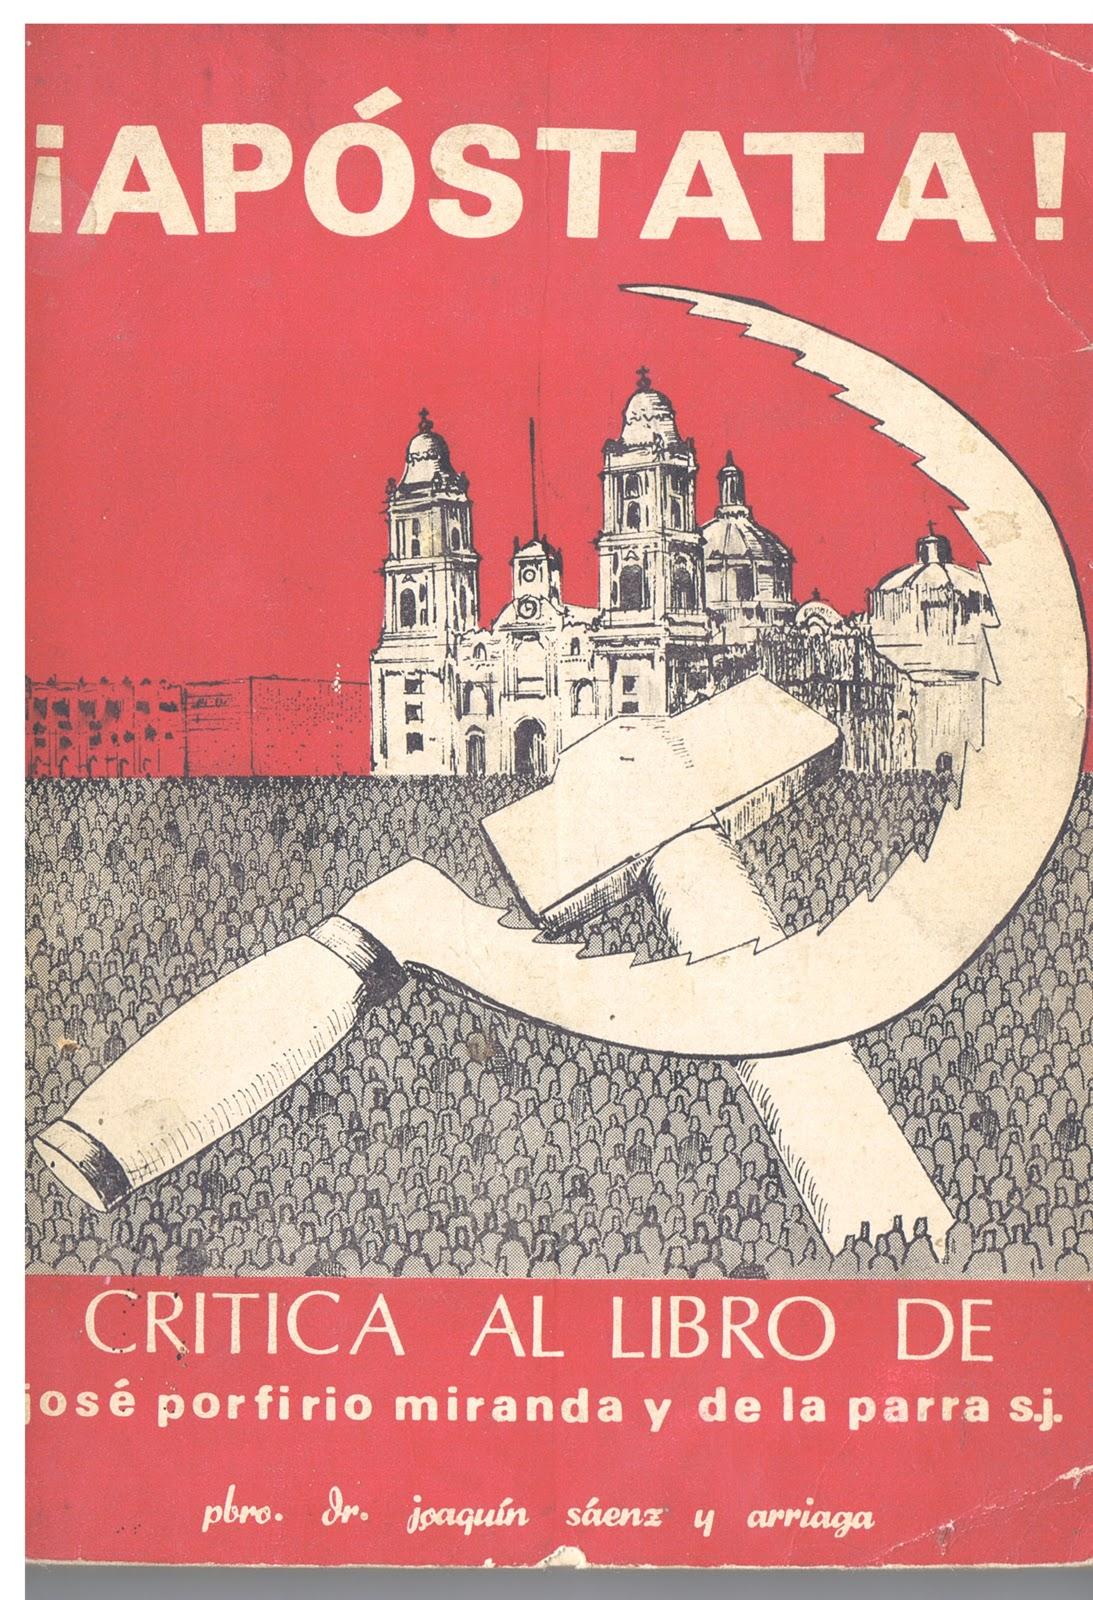 APOSTAT! (1971) Par le Rév. P. JOAQUIN SAENZ Y ARRIAGA  Apostata